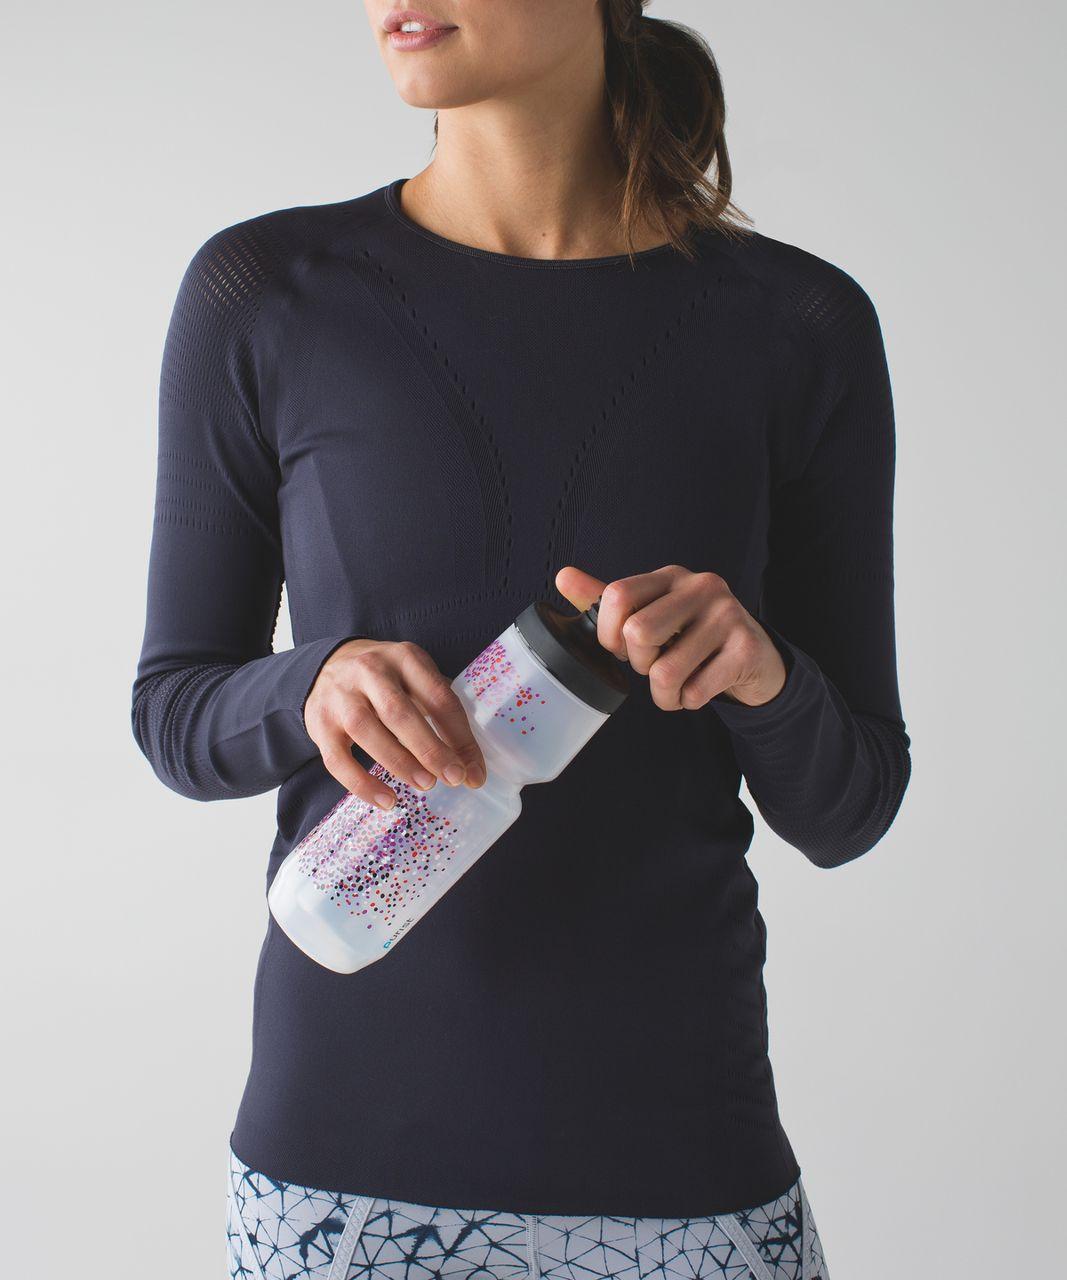 Lululemon Purist Cycling Water Bottle *26 oz - Dotted Speckle Ultra Violet Alarming